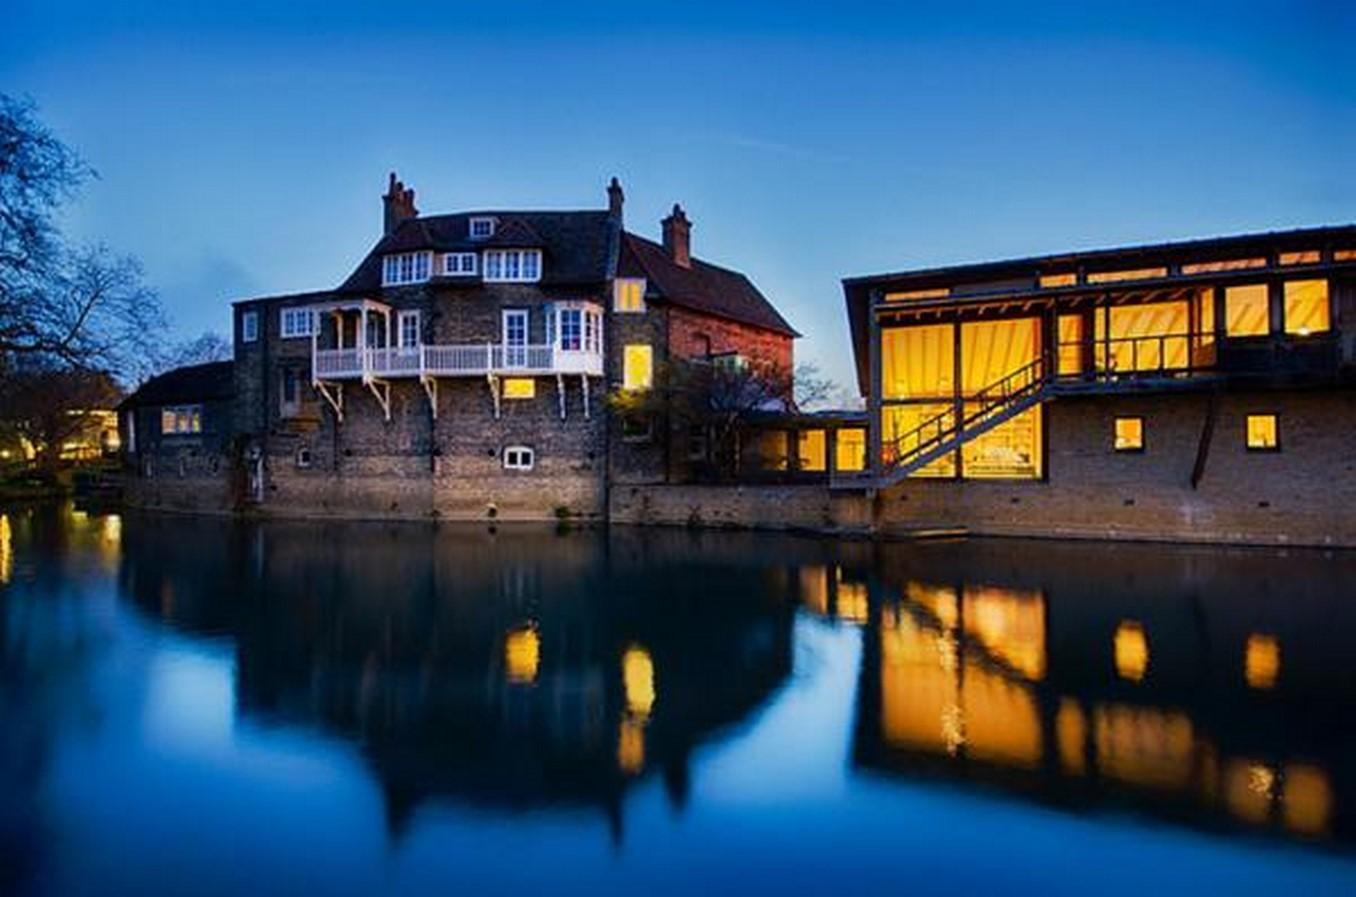 Edwardian architecture: The Grand Style - Sheet8